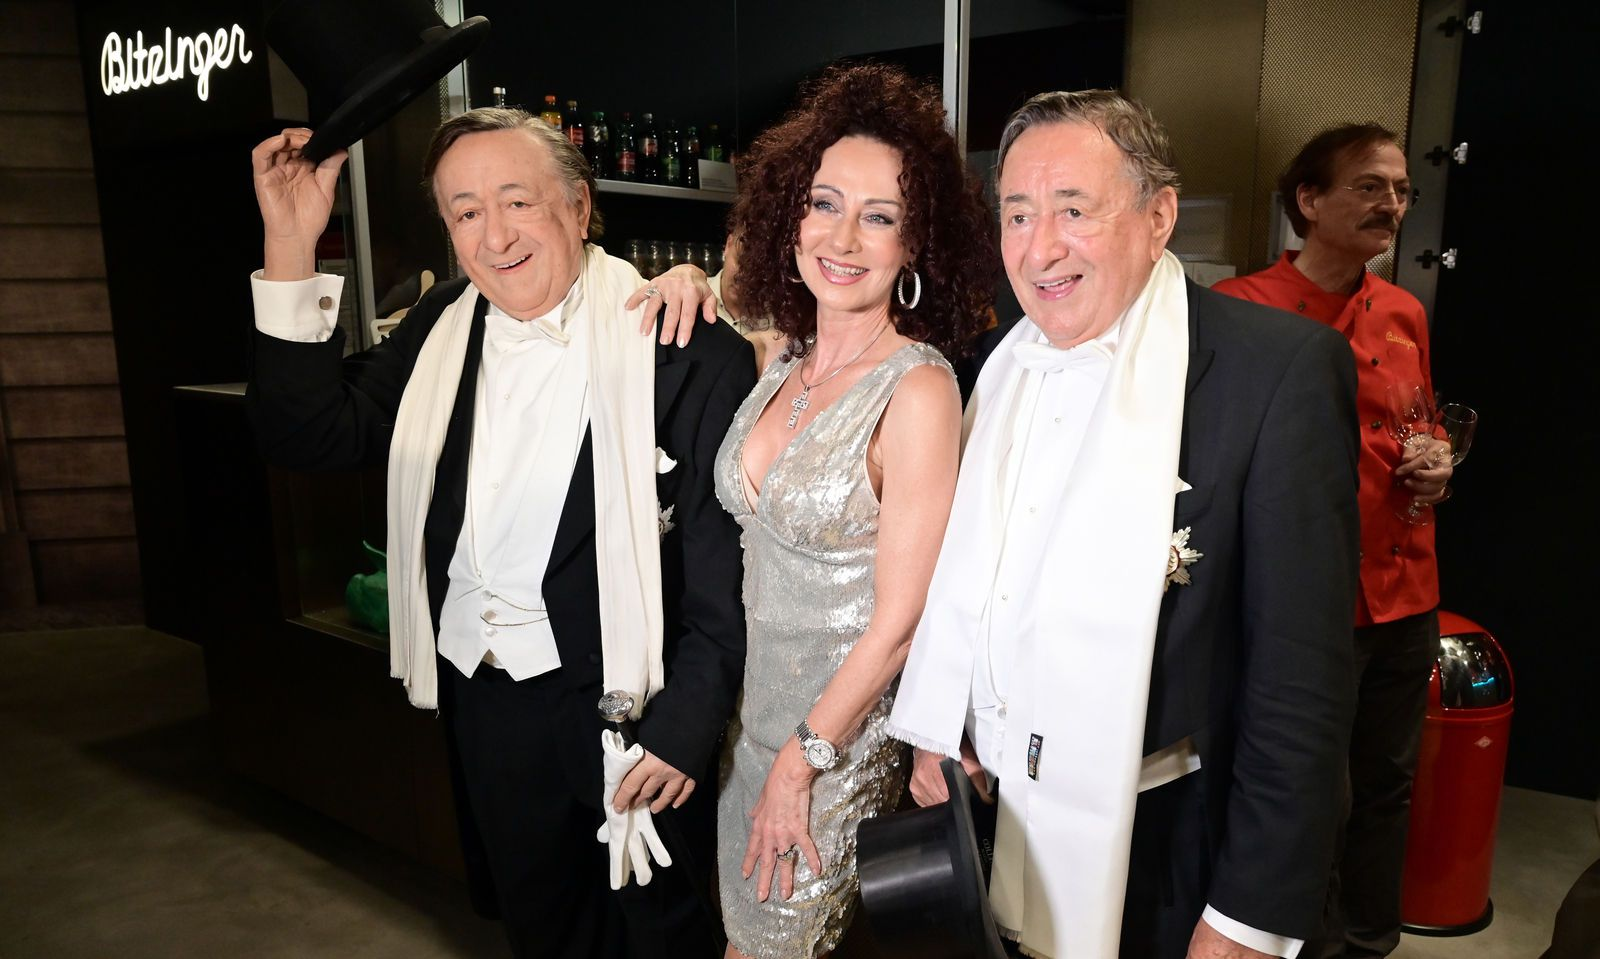 Von links nach rechts: Richard Lugner, Christina 'Mausi' Lugner, Richard Lugner